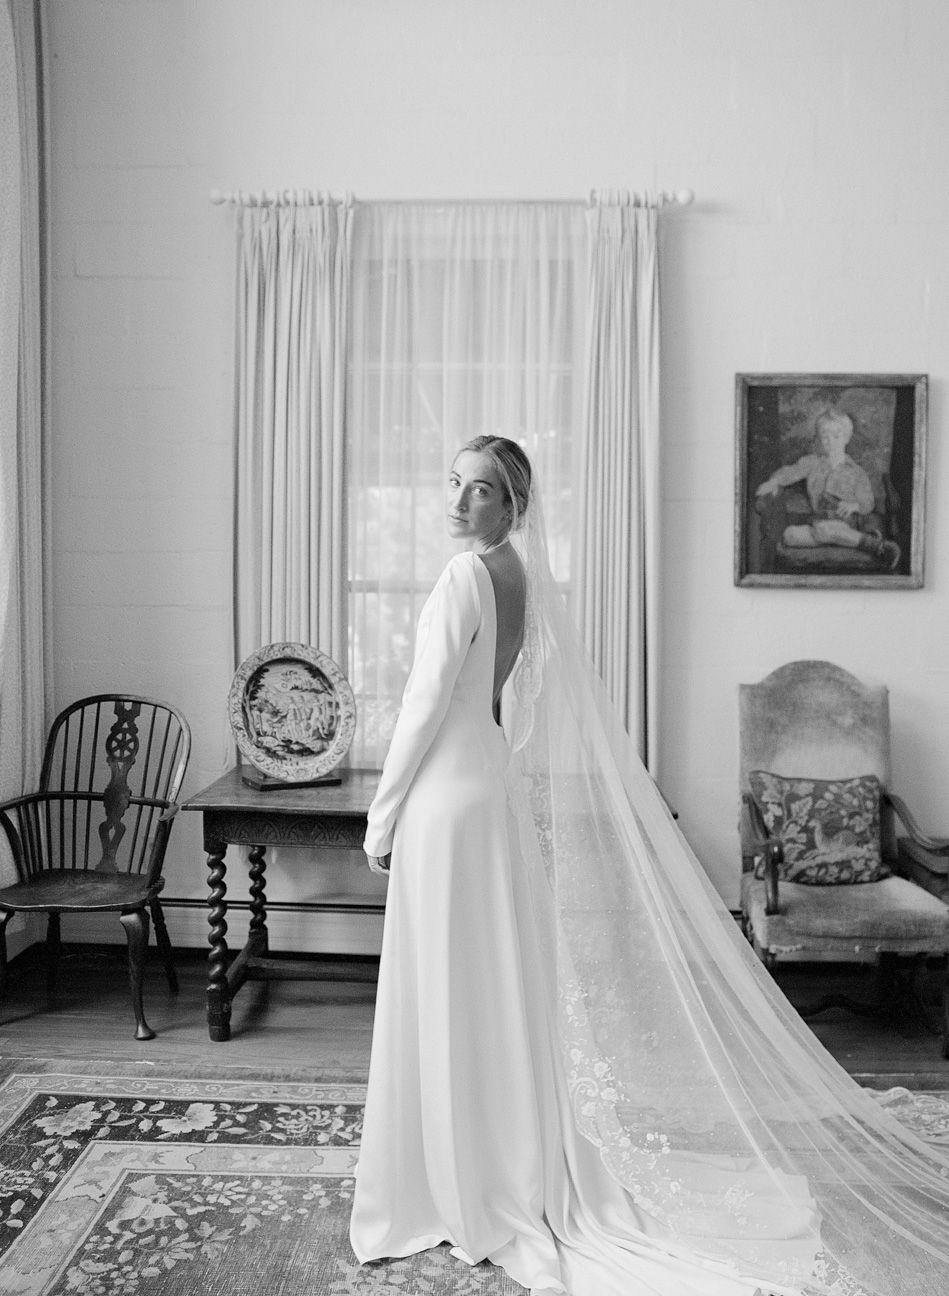 KarenHillPhotography-Nassikas-Wedding-SP-0017.jpg